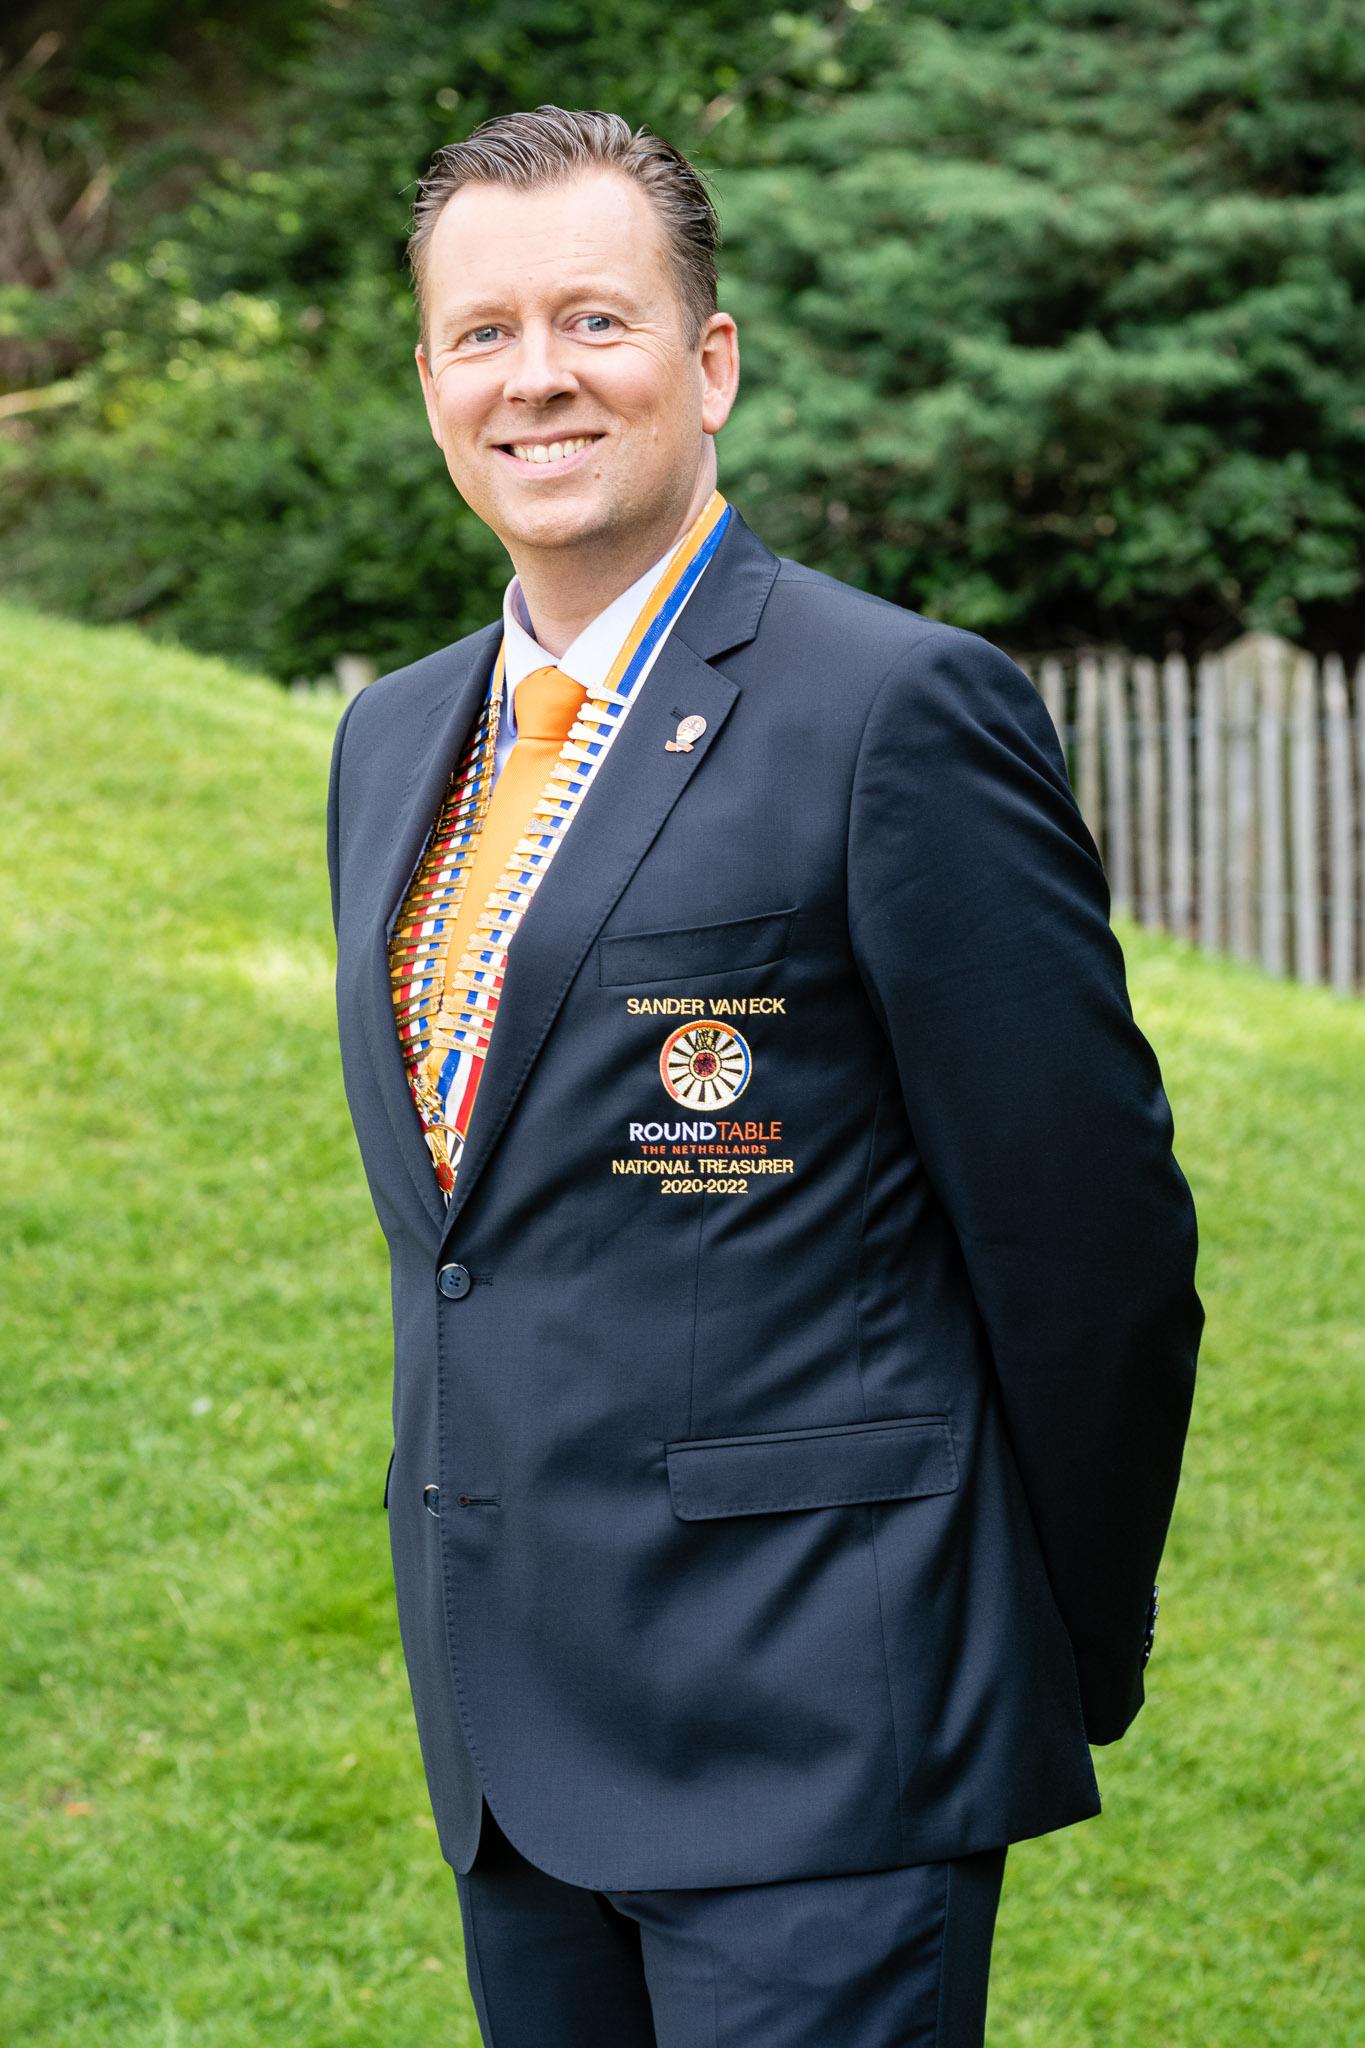 Sander van Eck